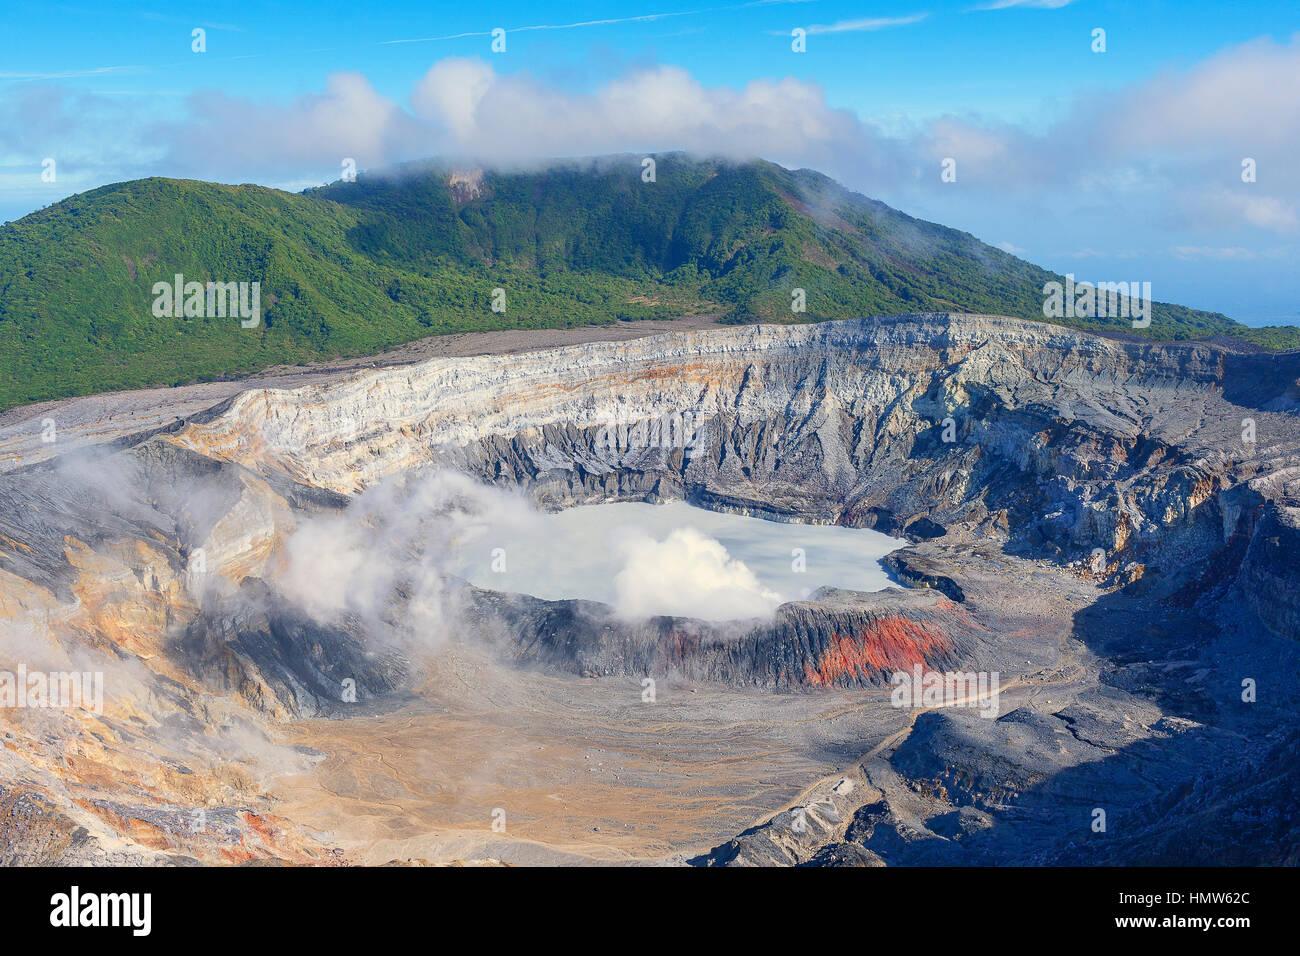 Caldera mit Kratersee, Dampf stieg von Poas Vulkan Poas Volcano National Park, Costa Rica Stockbild